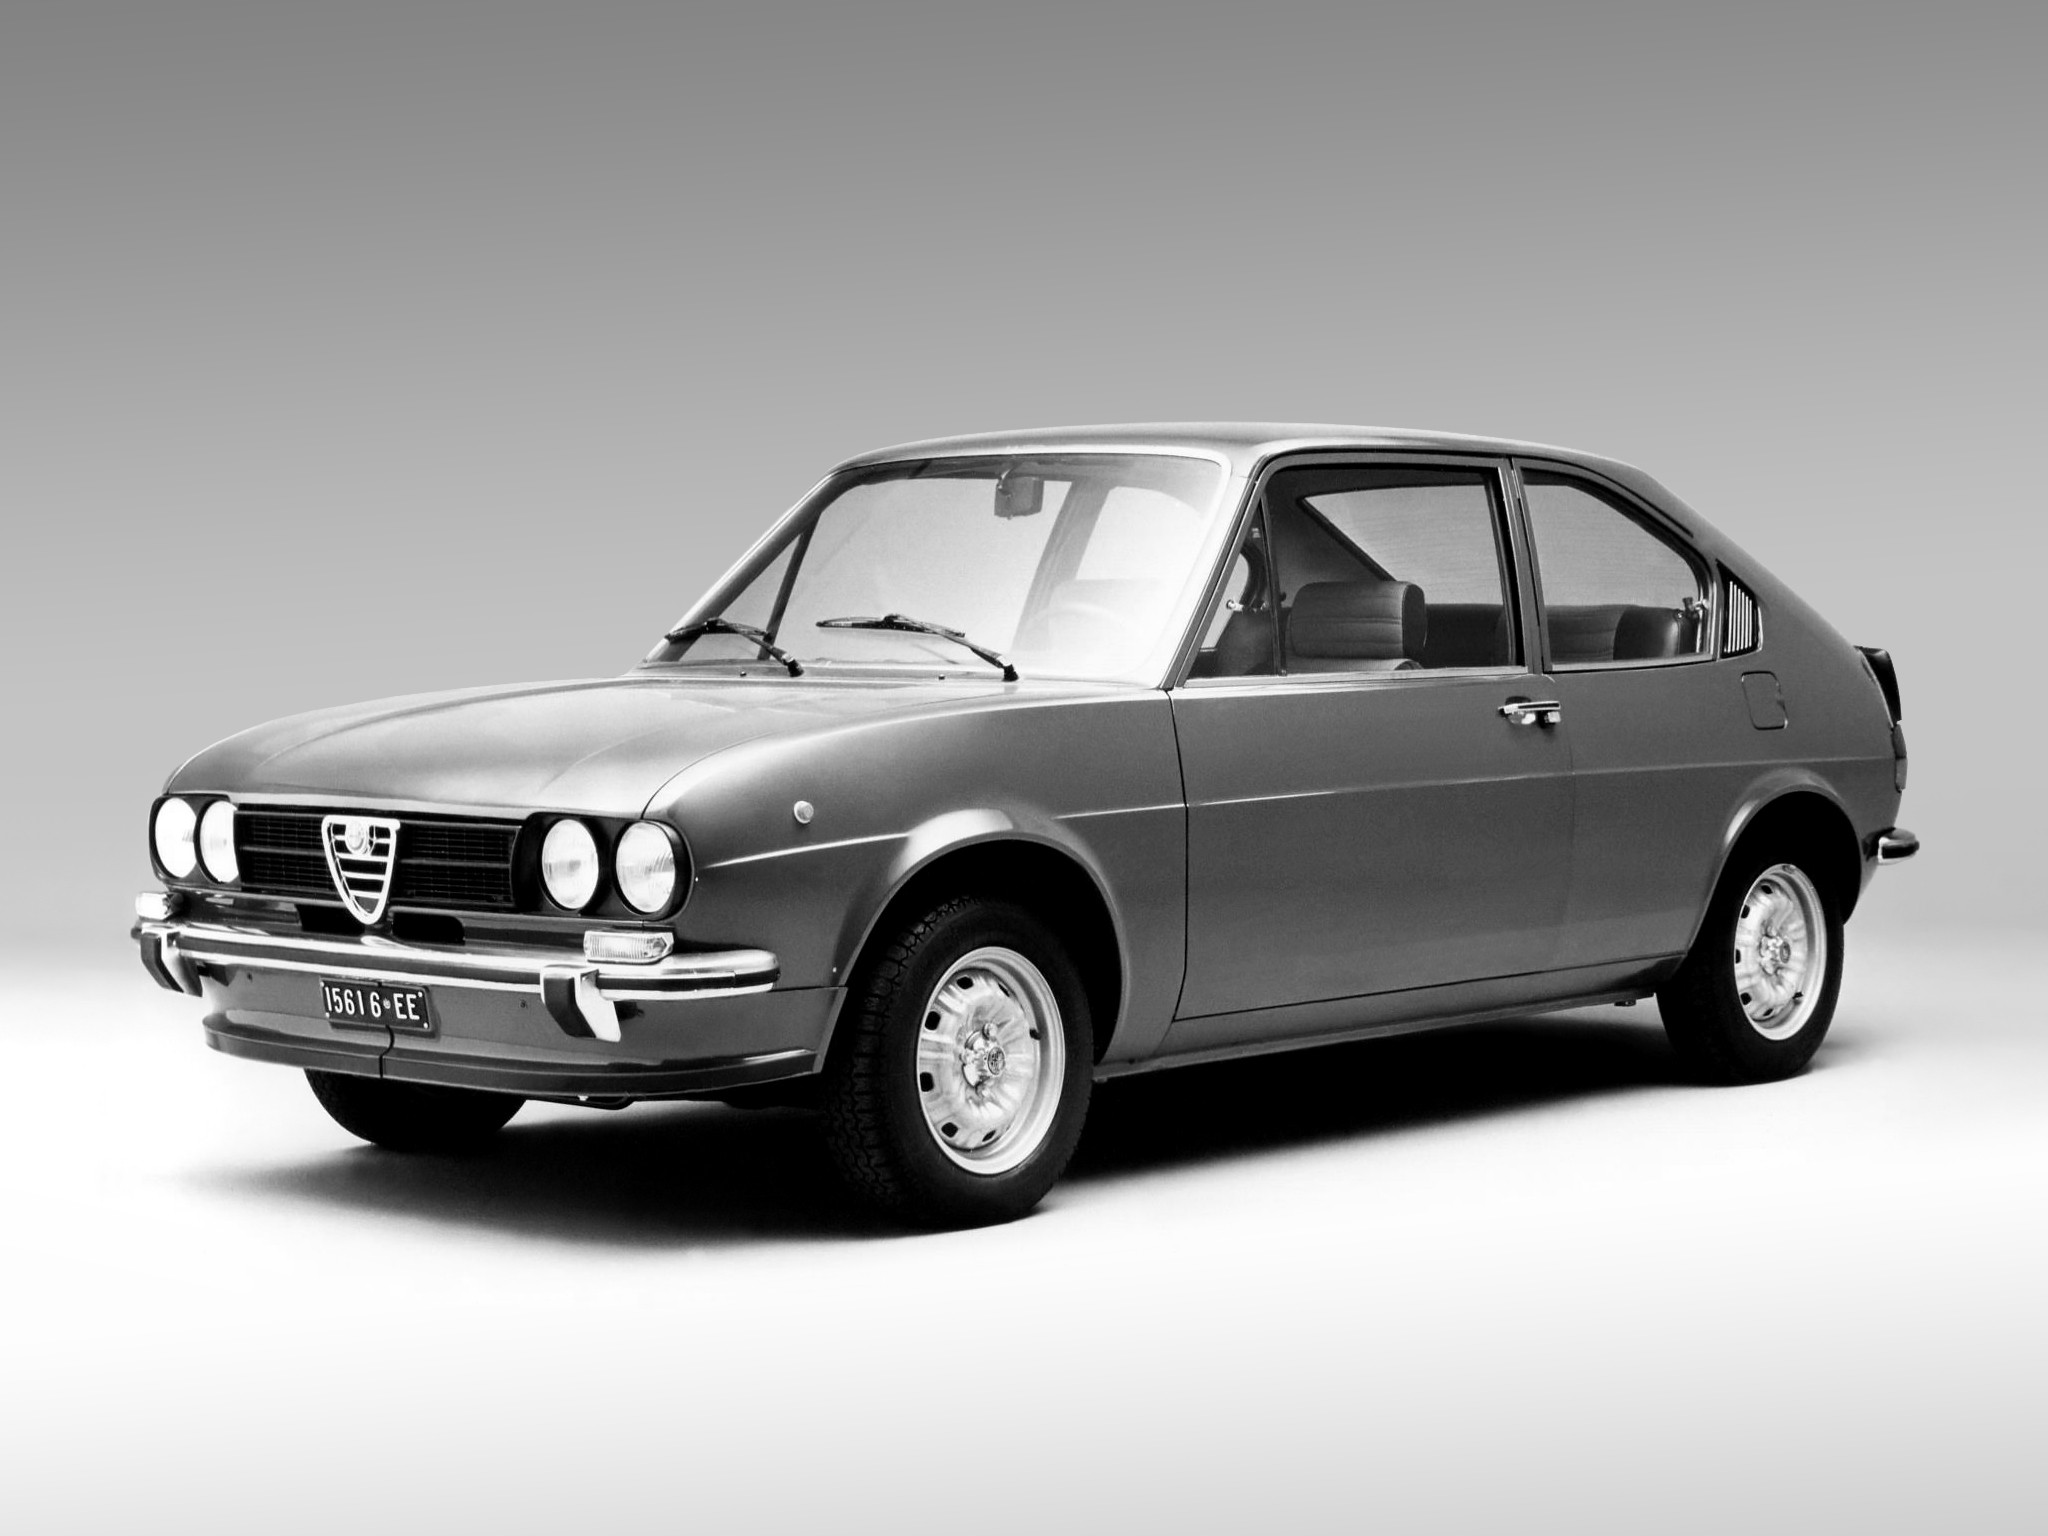 Alfa 4c 2019 >> ALFA ROMEO Alfasud TI specs & photos - 1973, 1974, 1975, 1976, 1977 - autoevolution